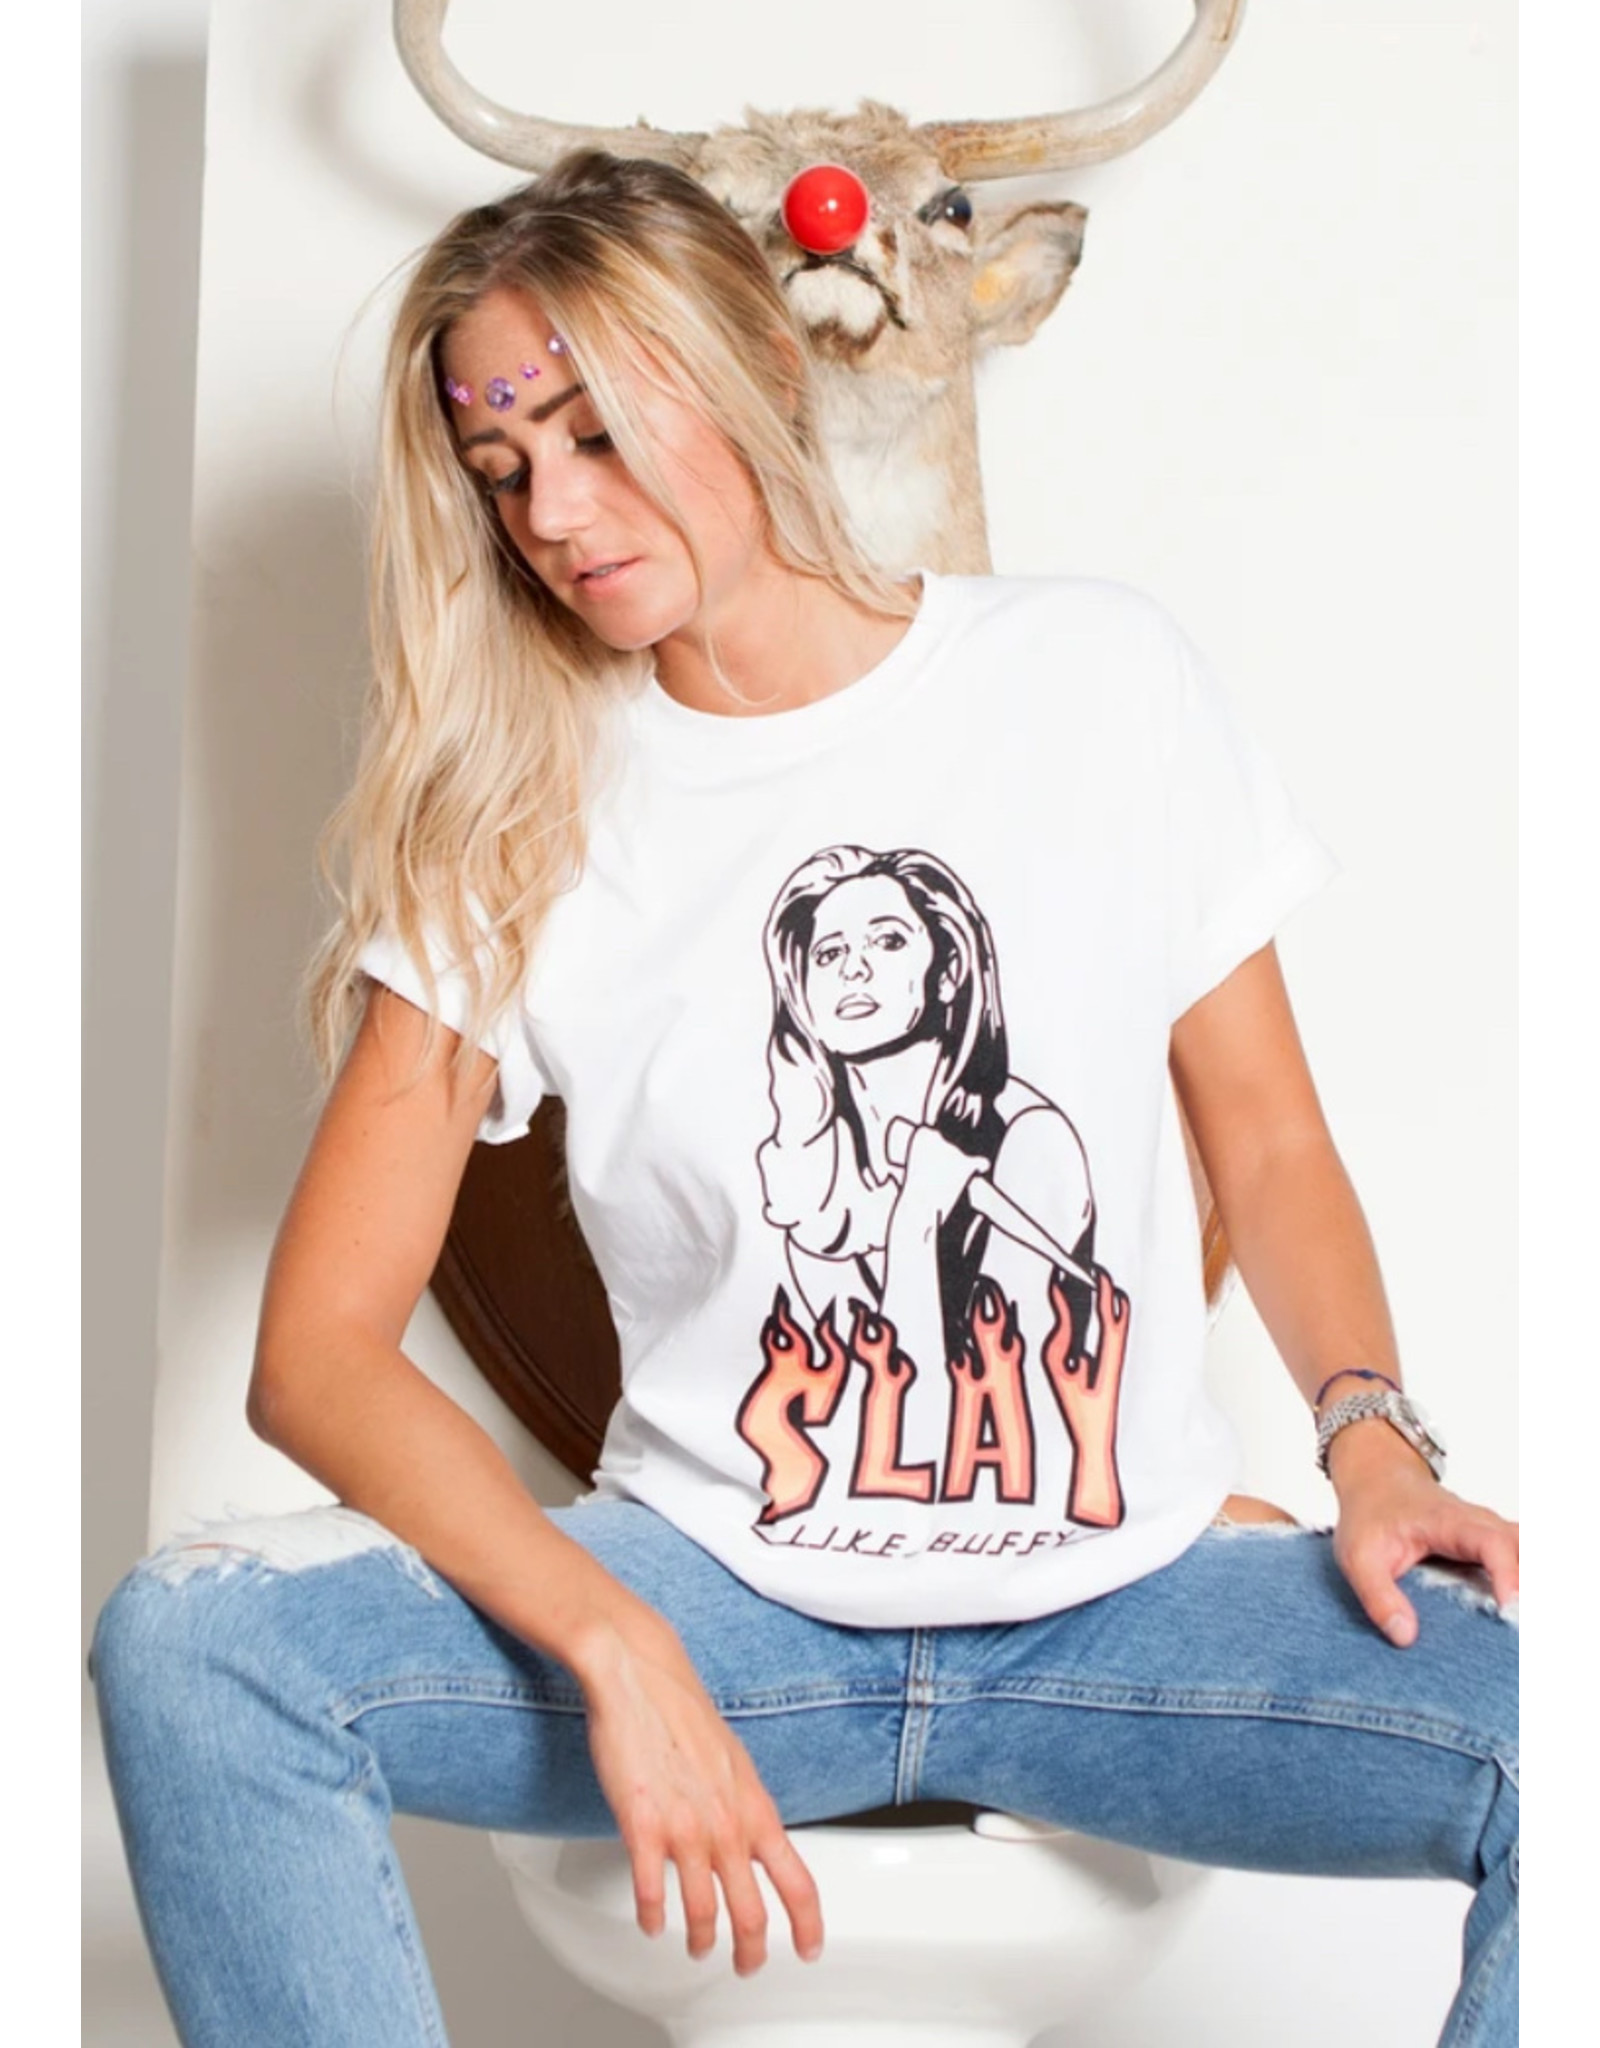 Spilt Milk T-shirt Slay like Buffy